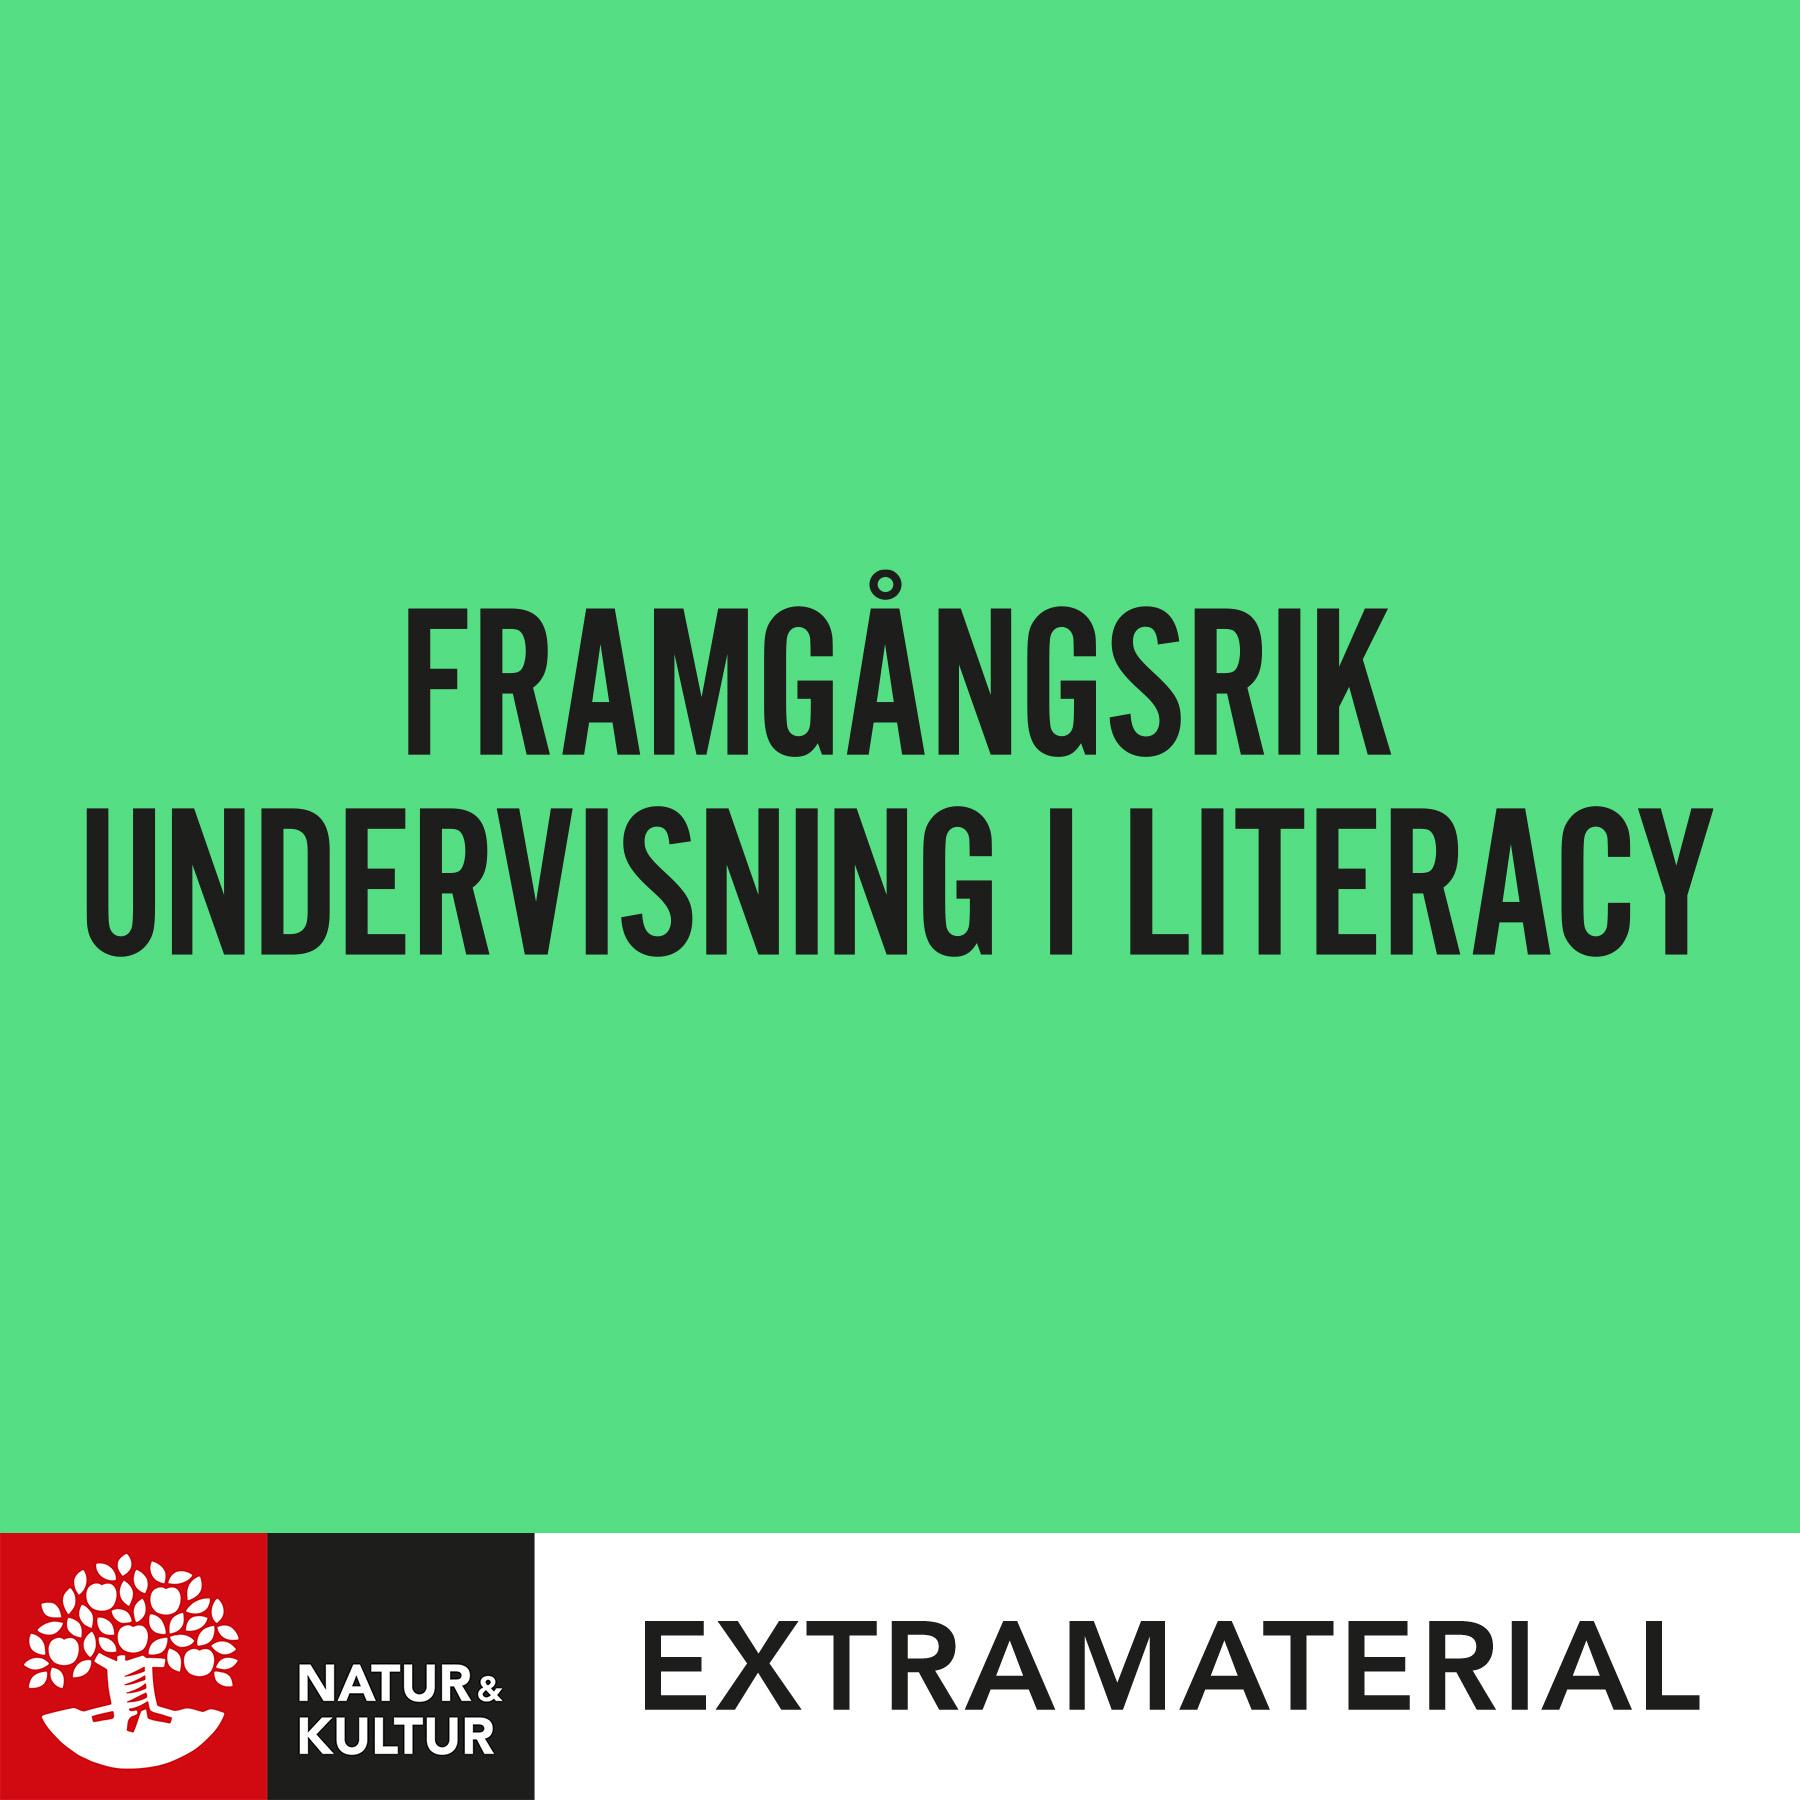 Framgångsrik undervisning i literacy